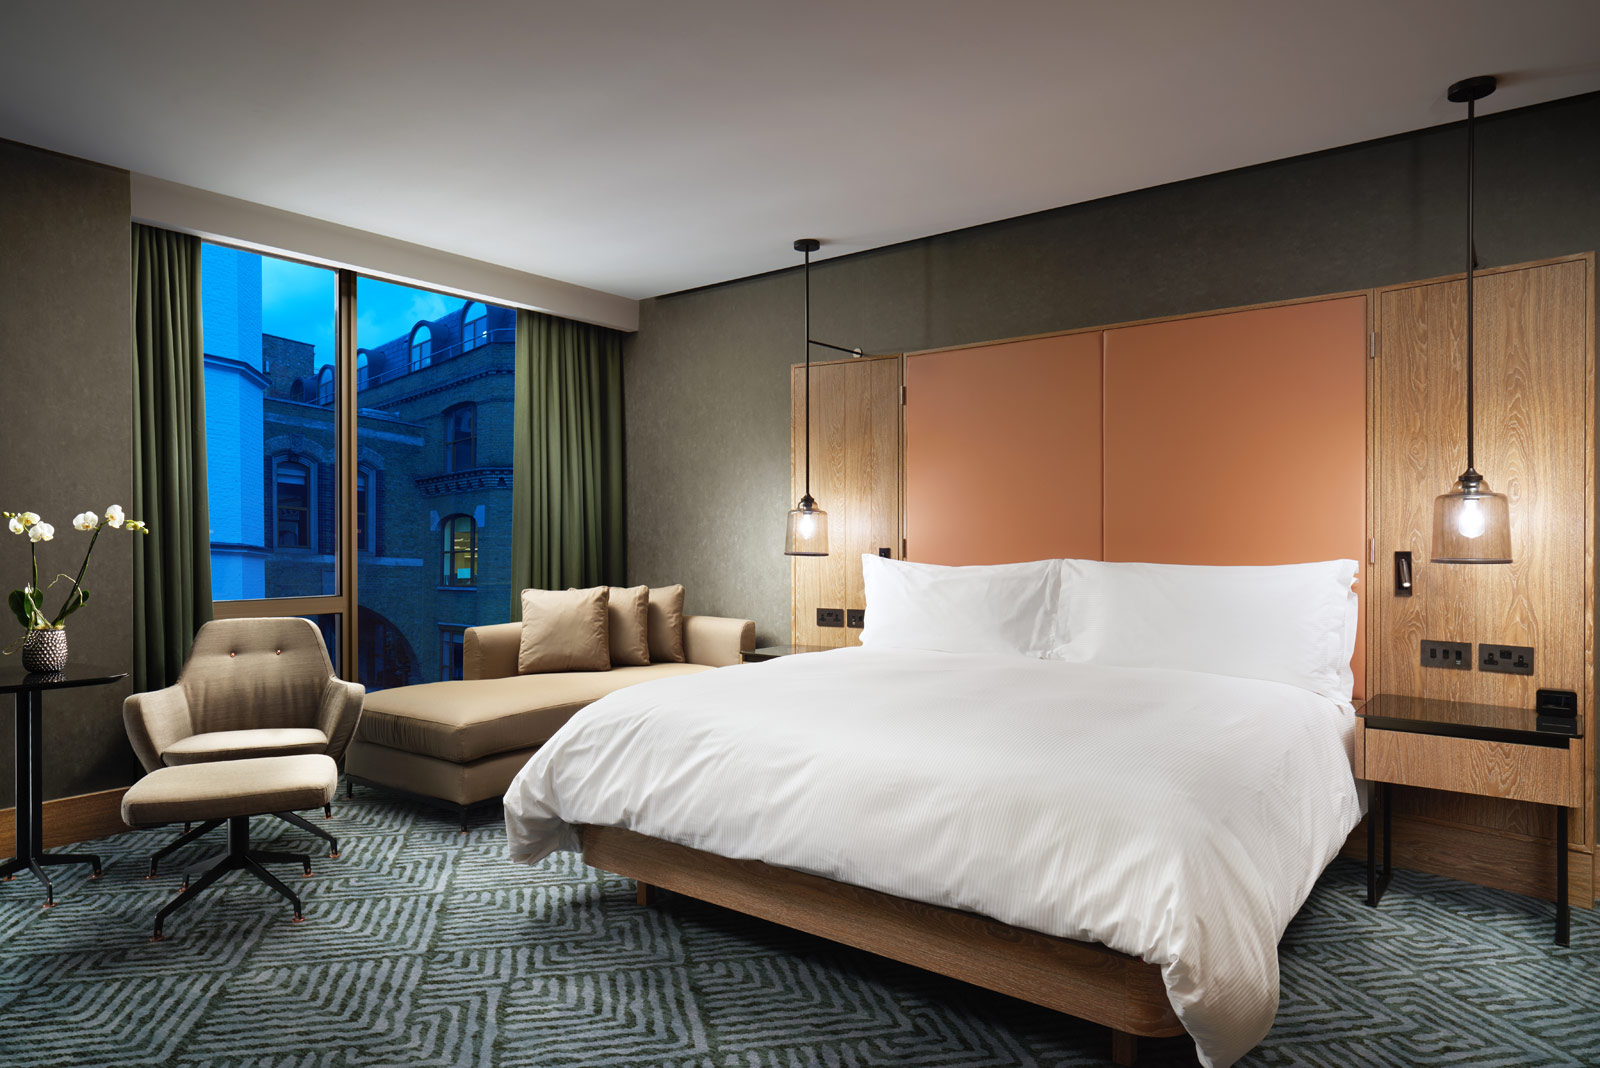 Bedroom suite at the Hilton London Bankside